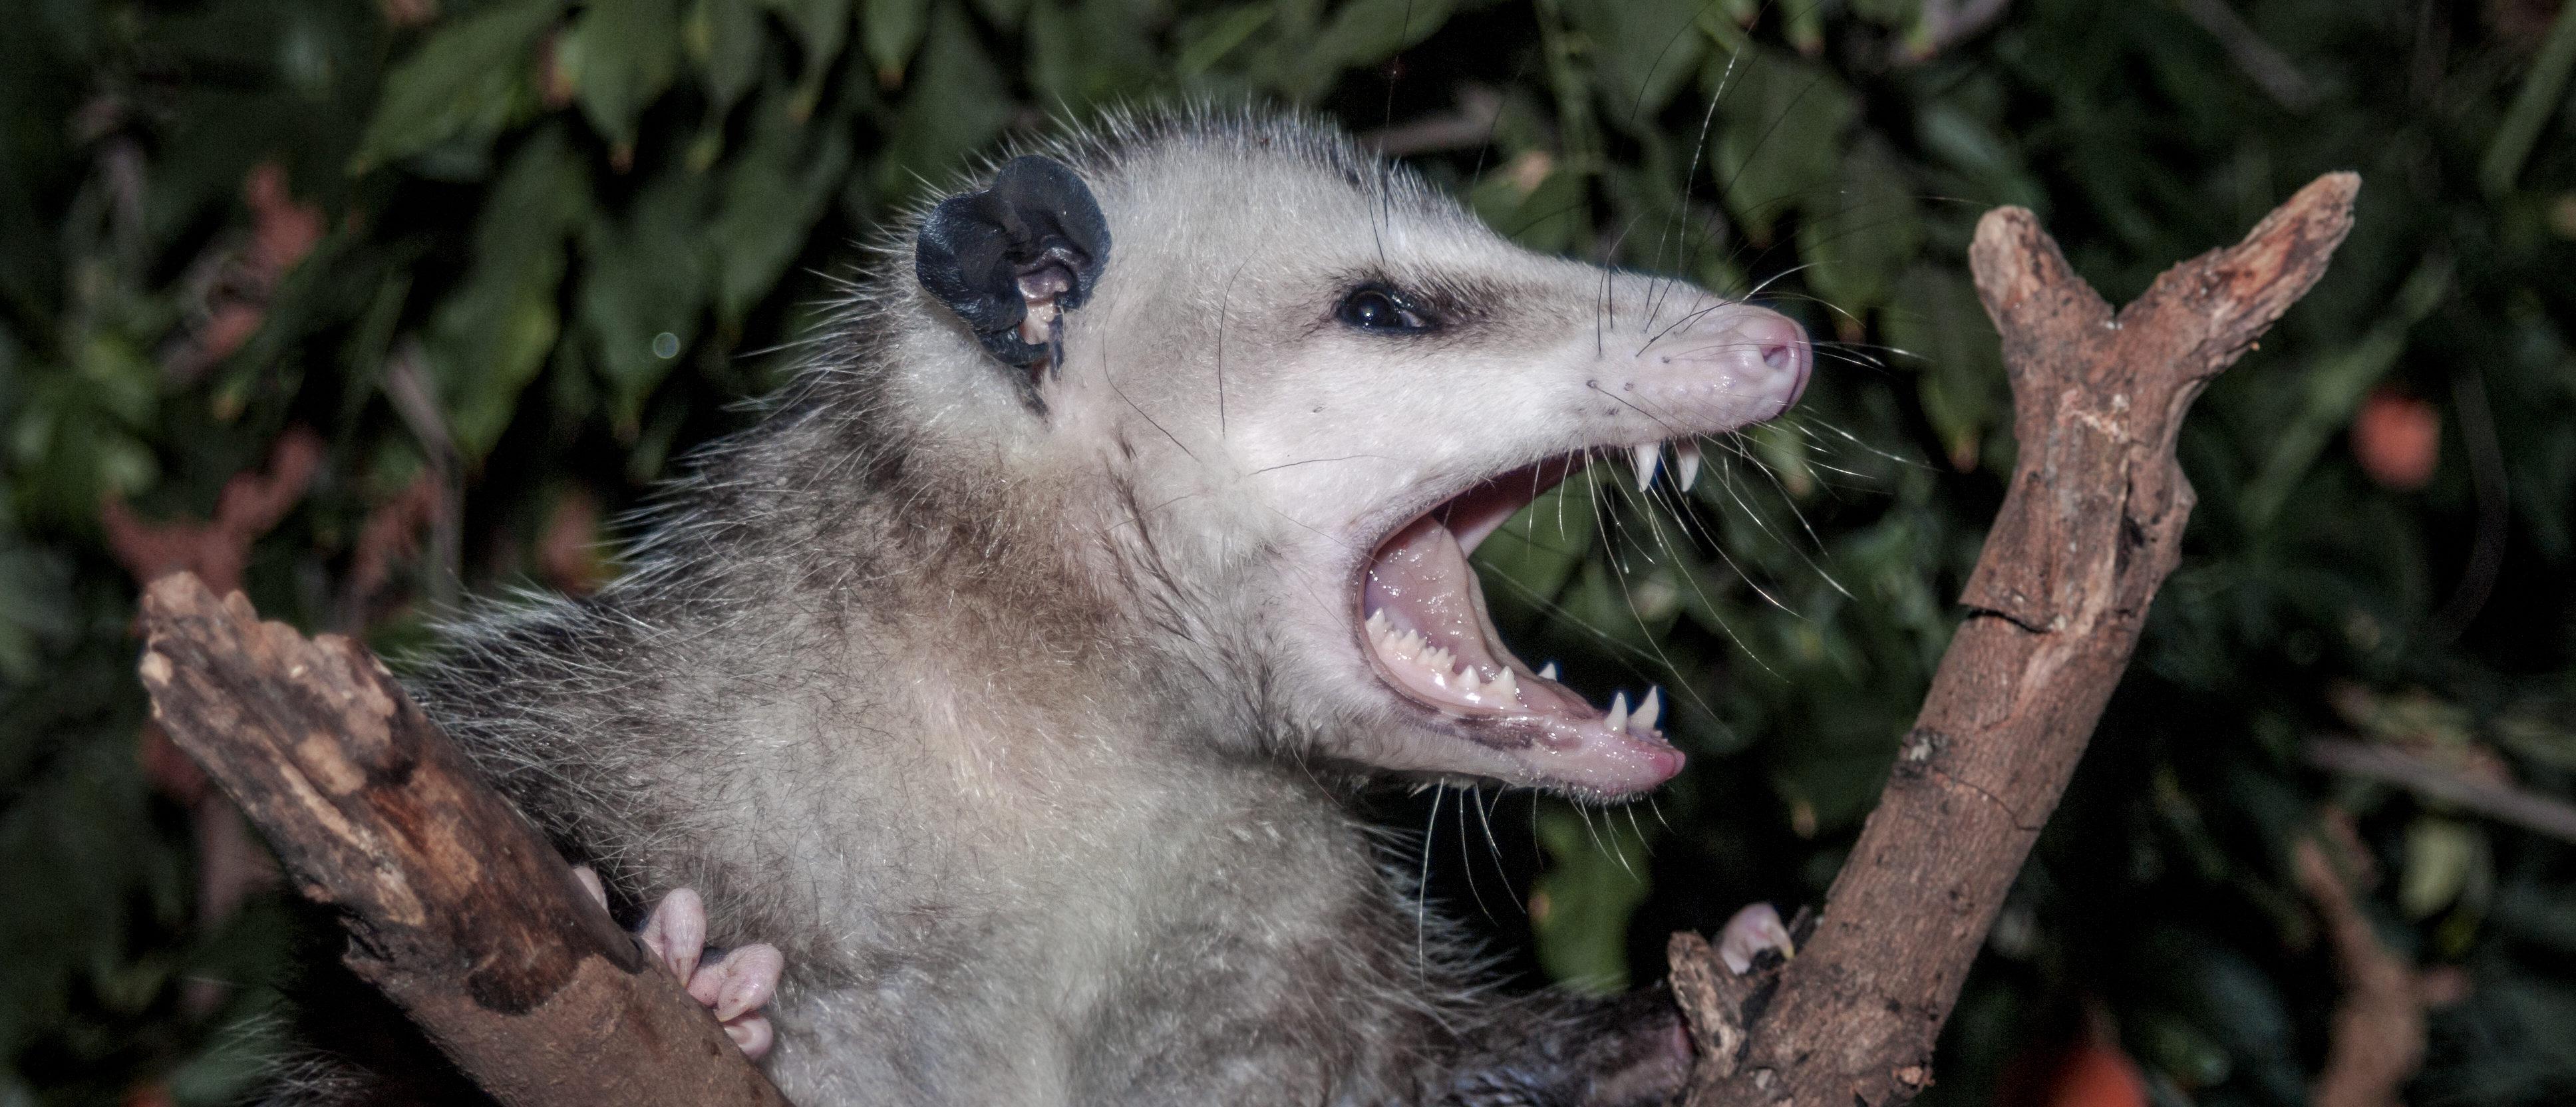 Massive Spider Eats Possum In Australia